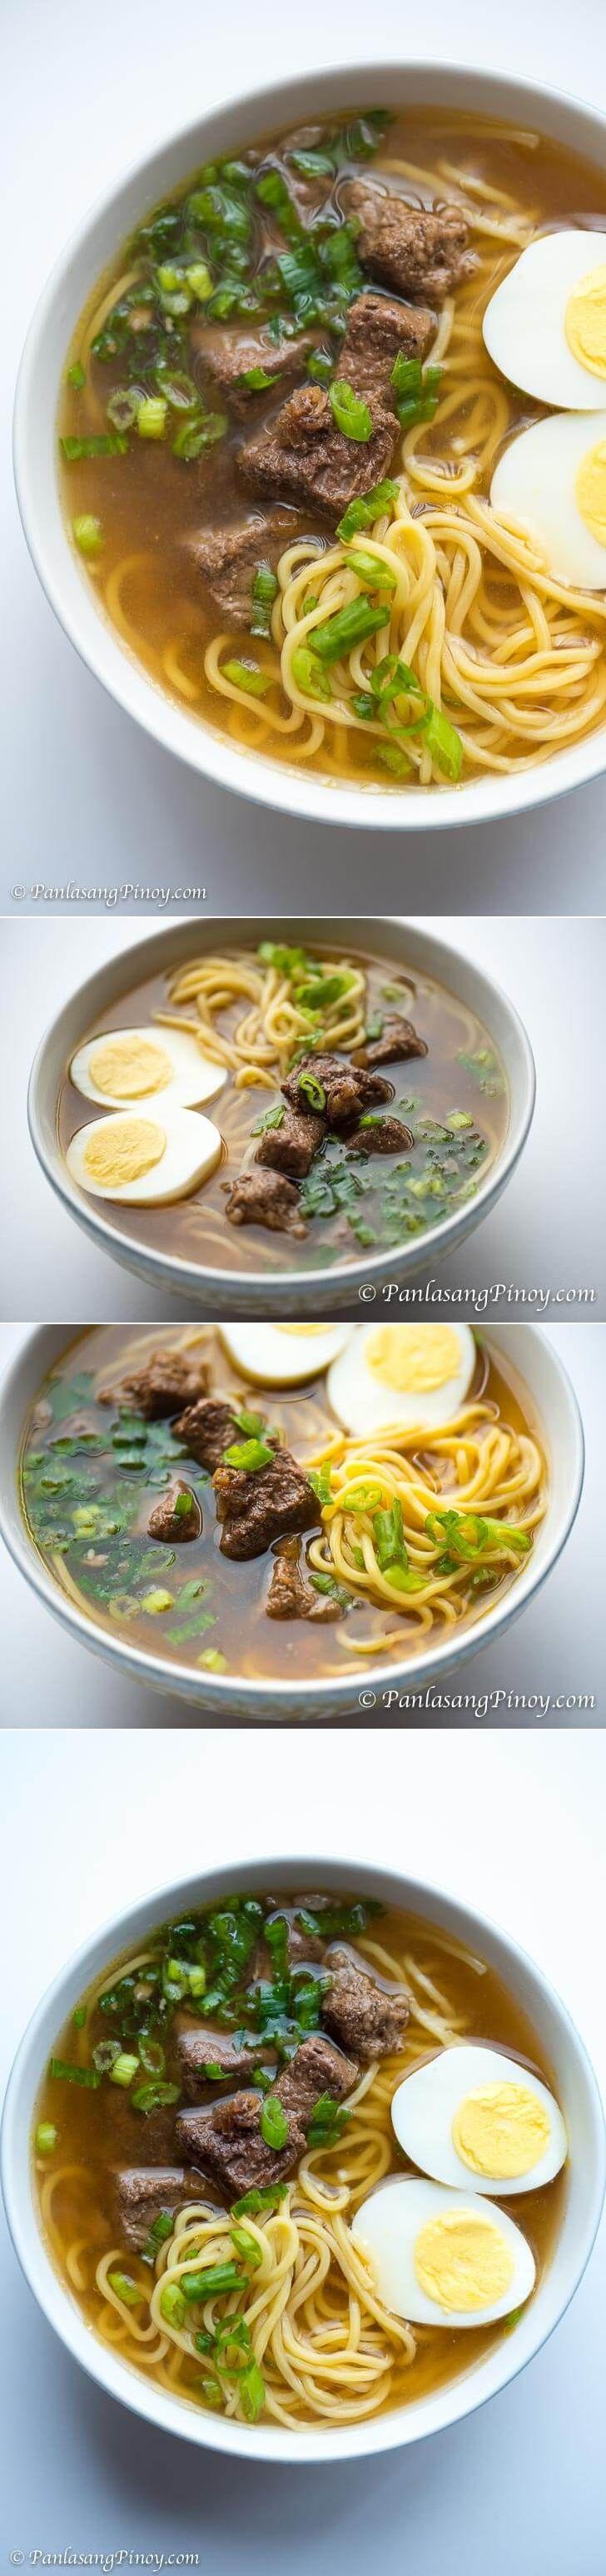 Beef Pares Mami Noodles Recipe Panlasang Pinoy Recipe Food Beef Pares Recipes